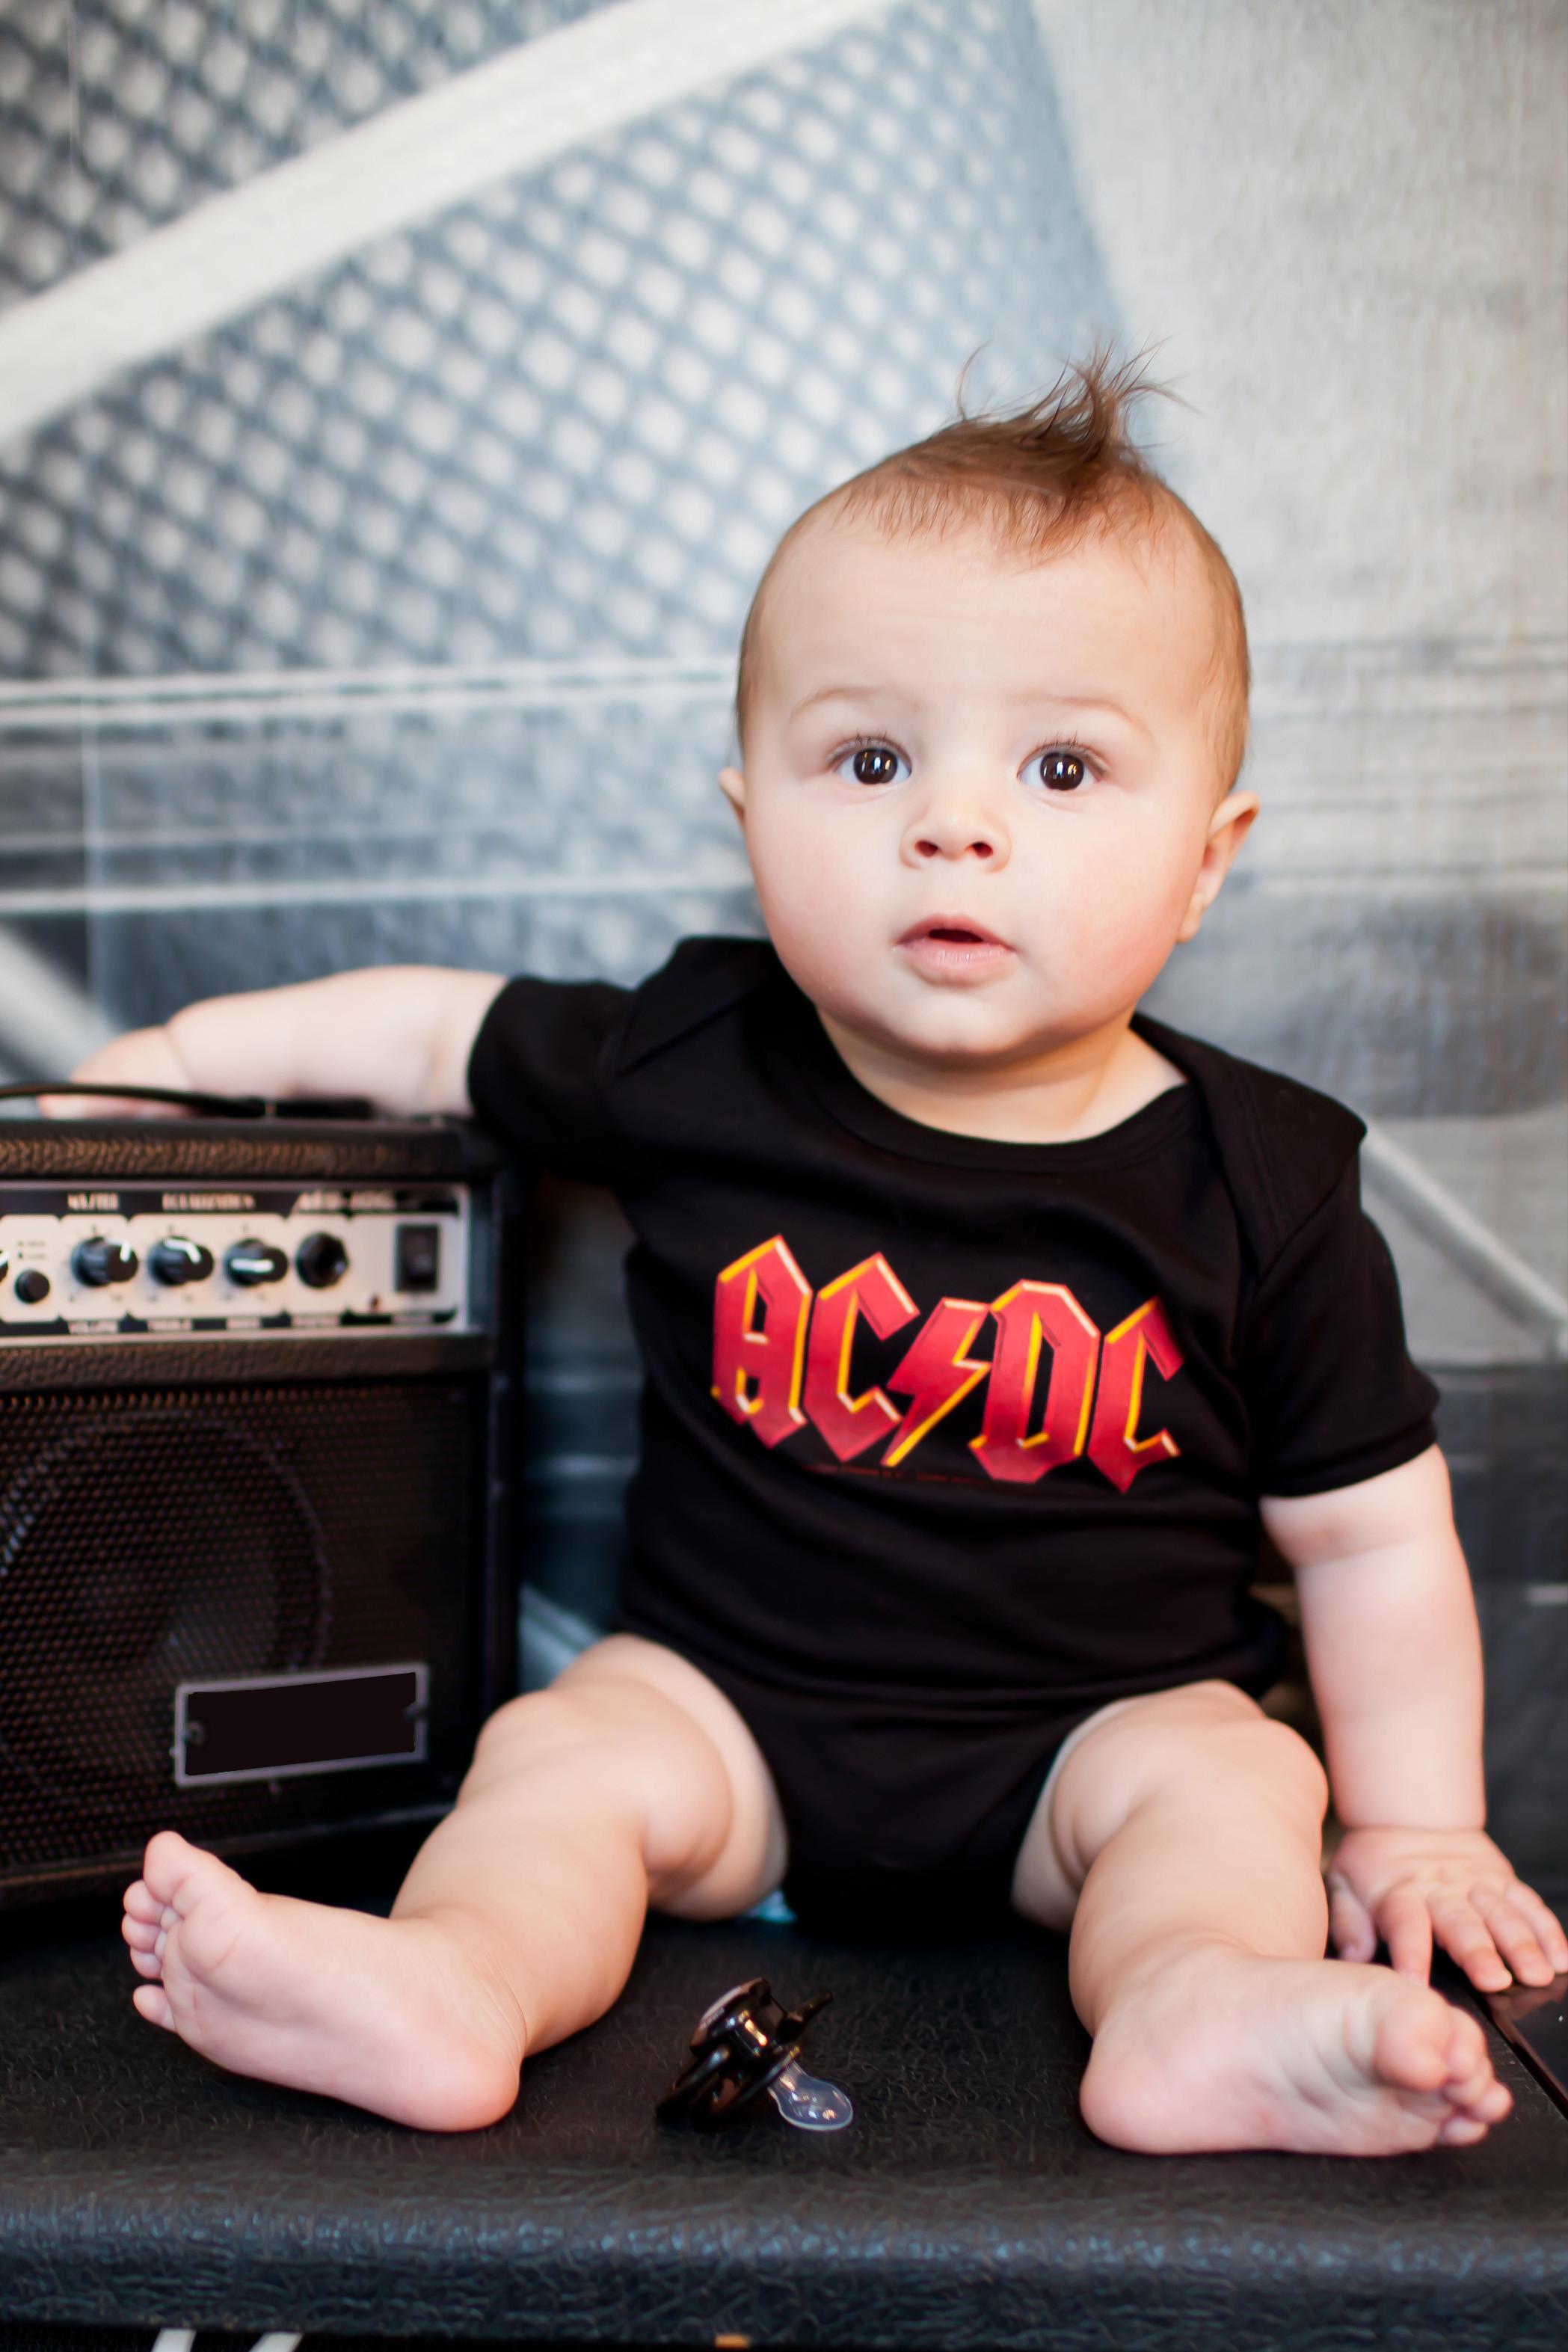 ACDC Baby Body